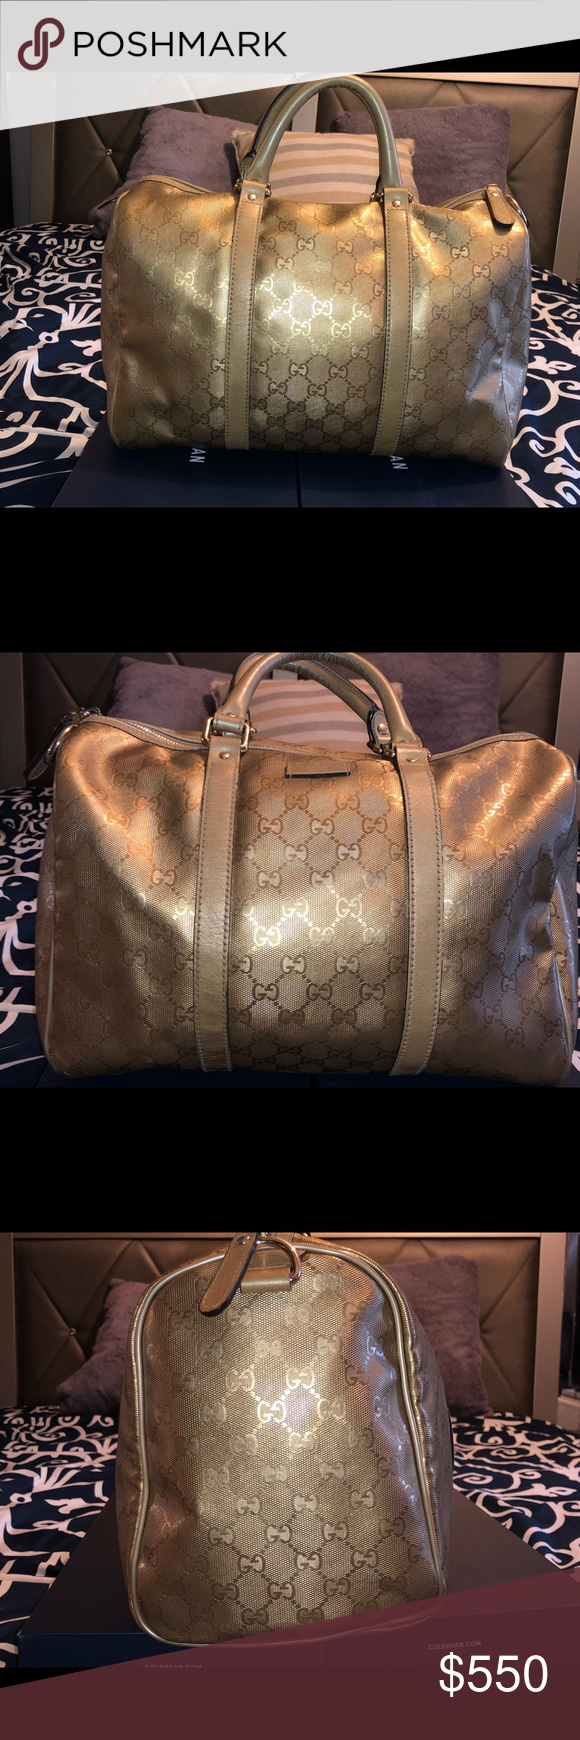 0eb7c3044725 Gucci Guccissima Metallic Gold Joy Boston This authentic Gucci Joy Boston  Bag GG Coated Canvas Medium